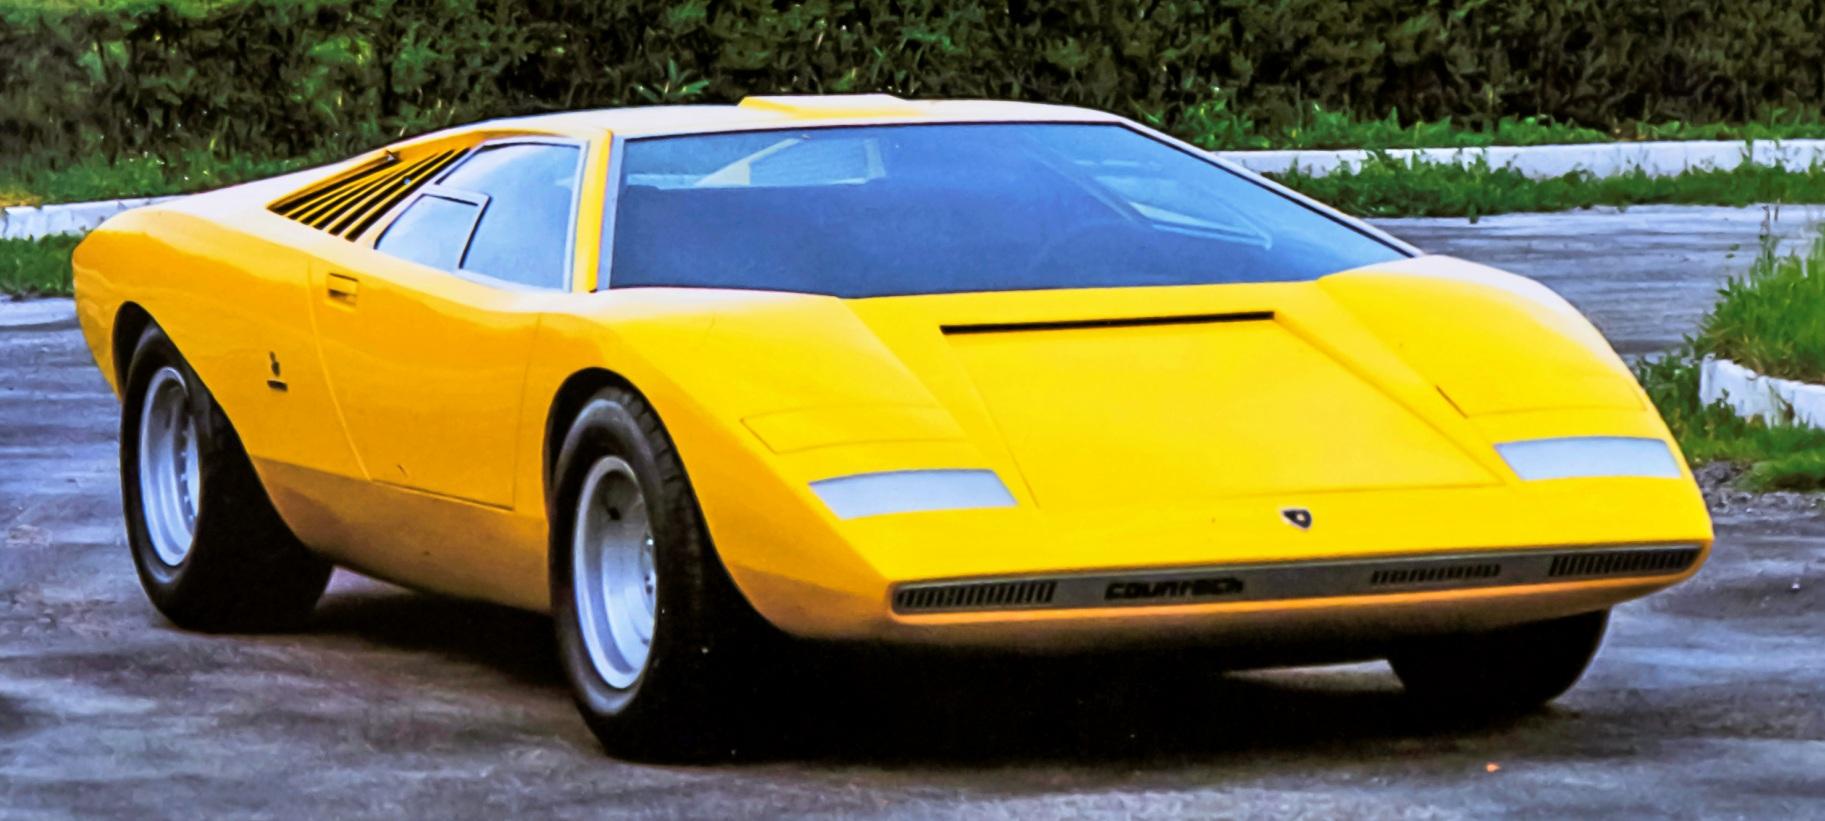 Lamborghini Countach LP 500 przód